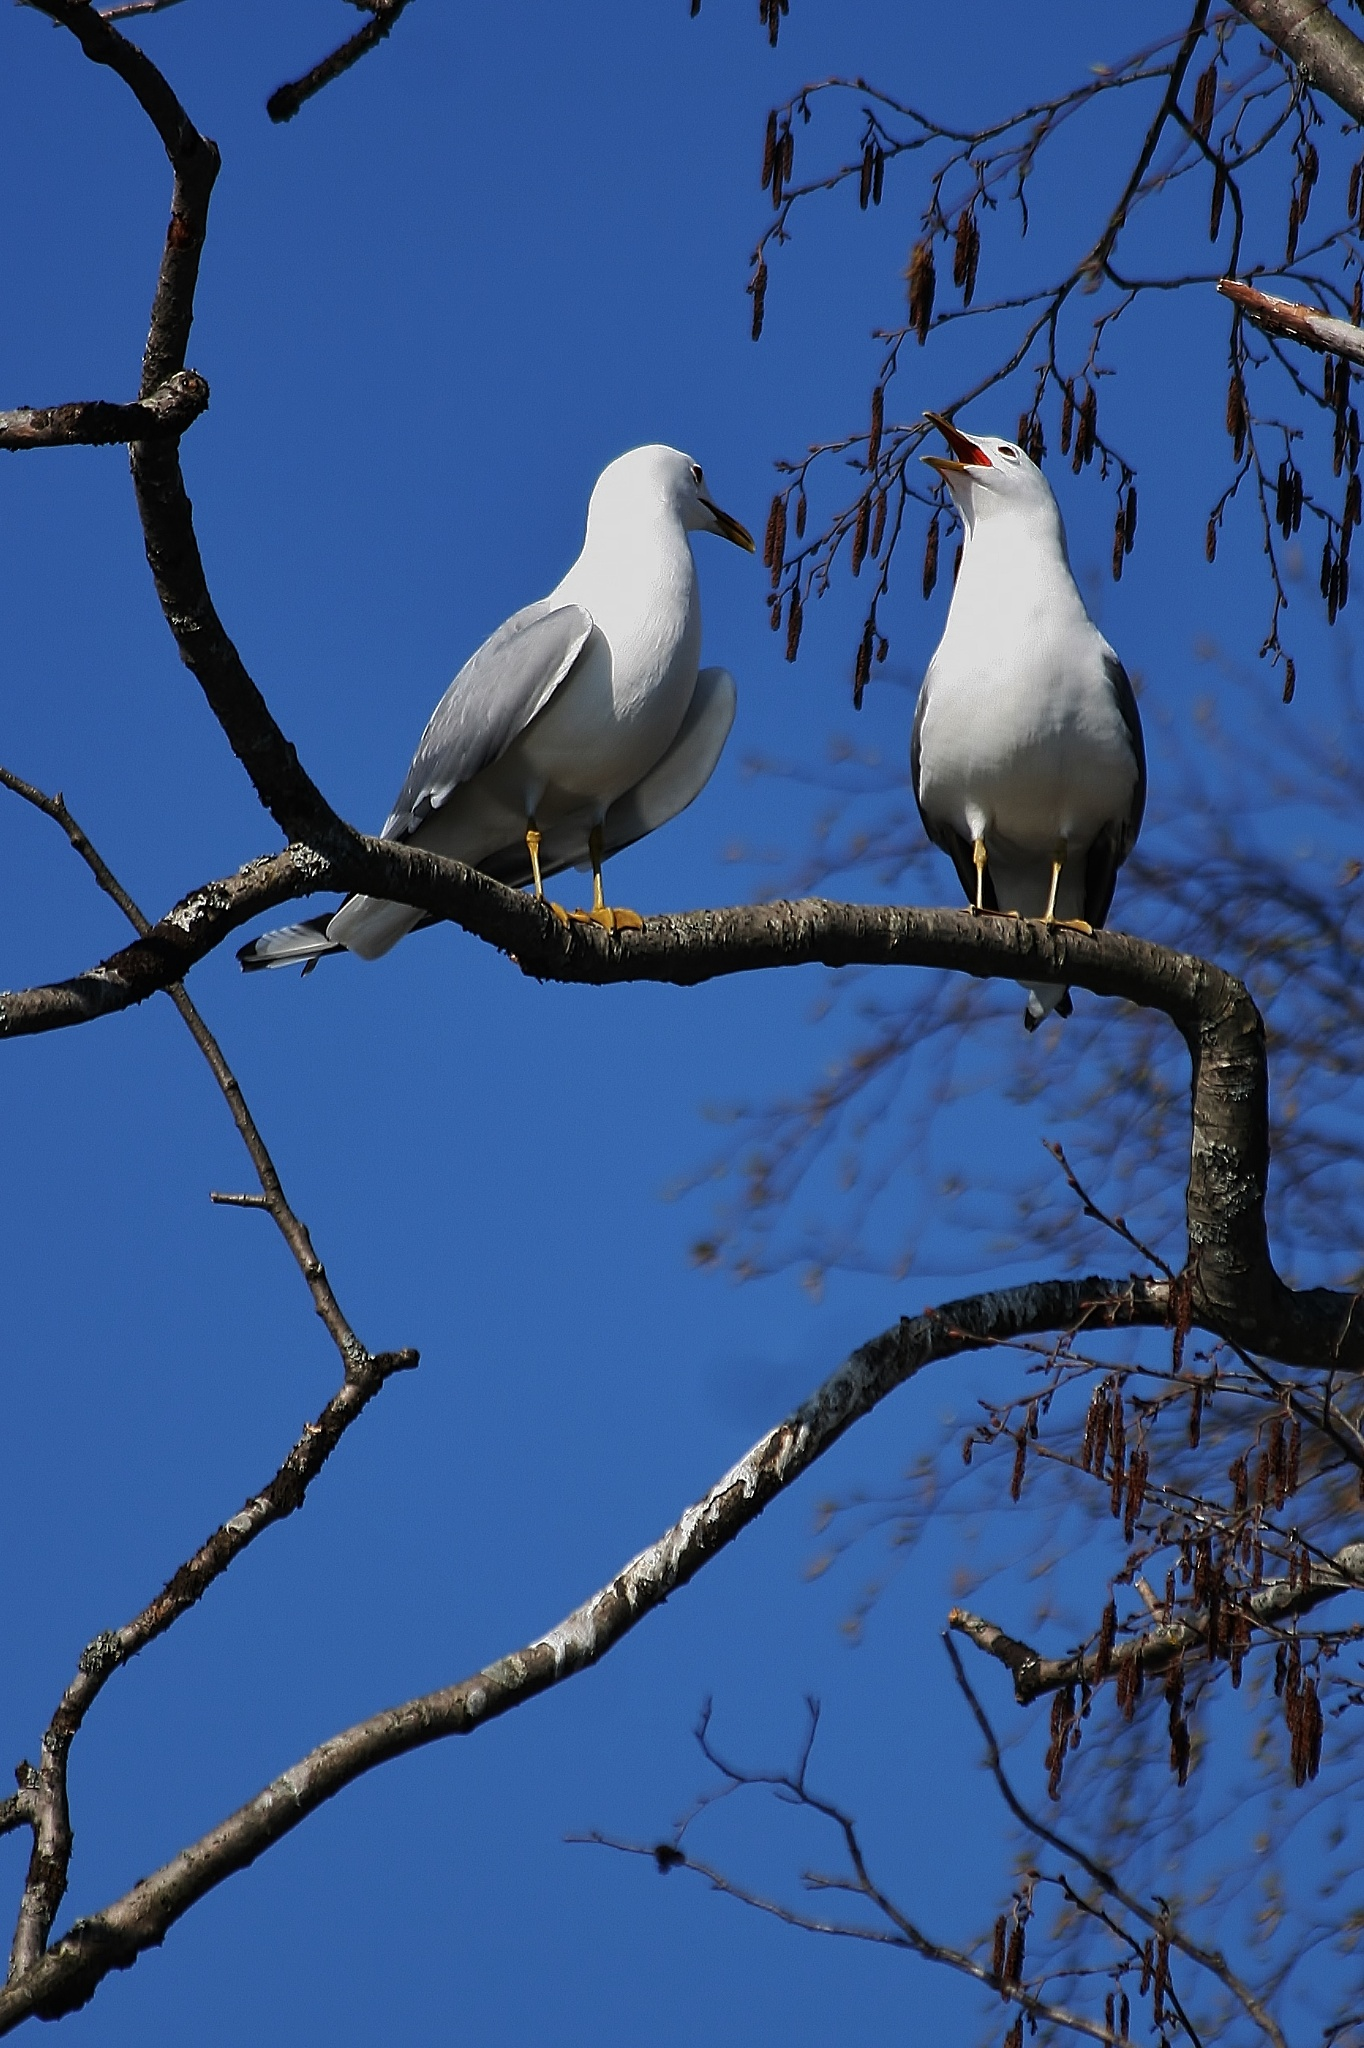 lovebirds by antsatykkylainen